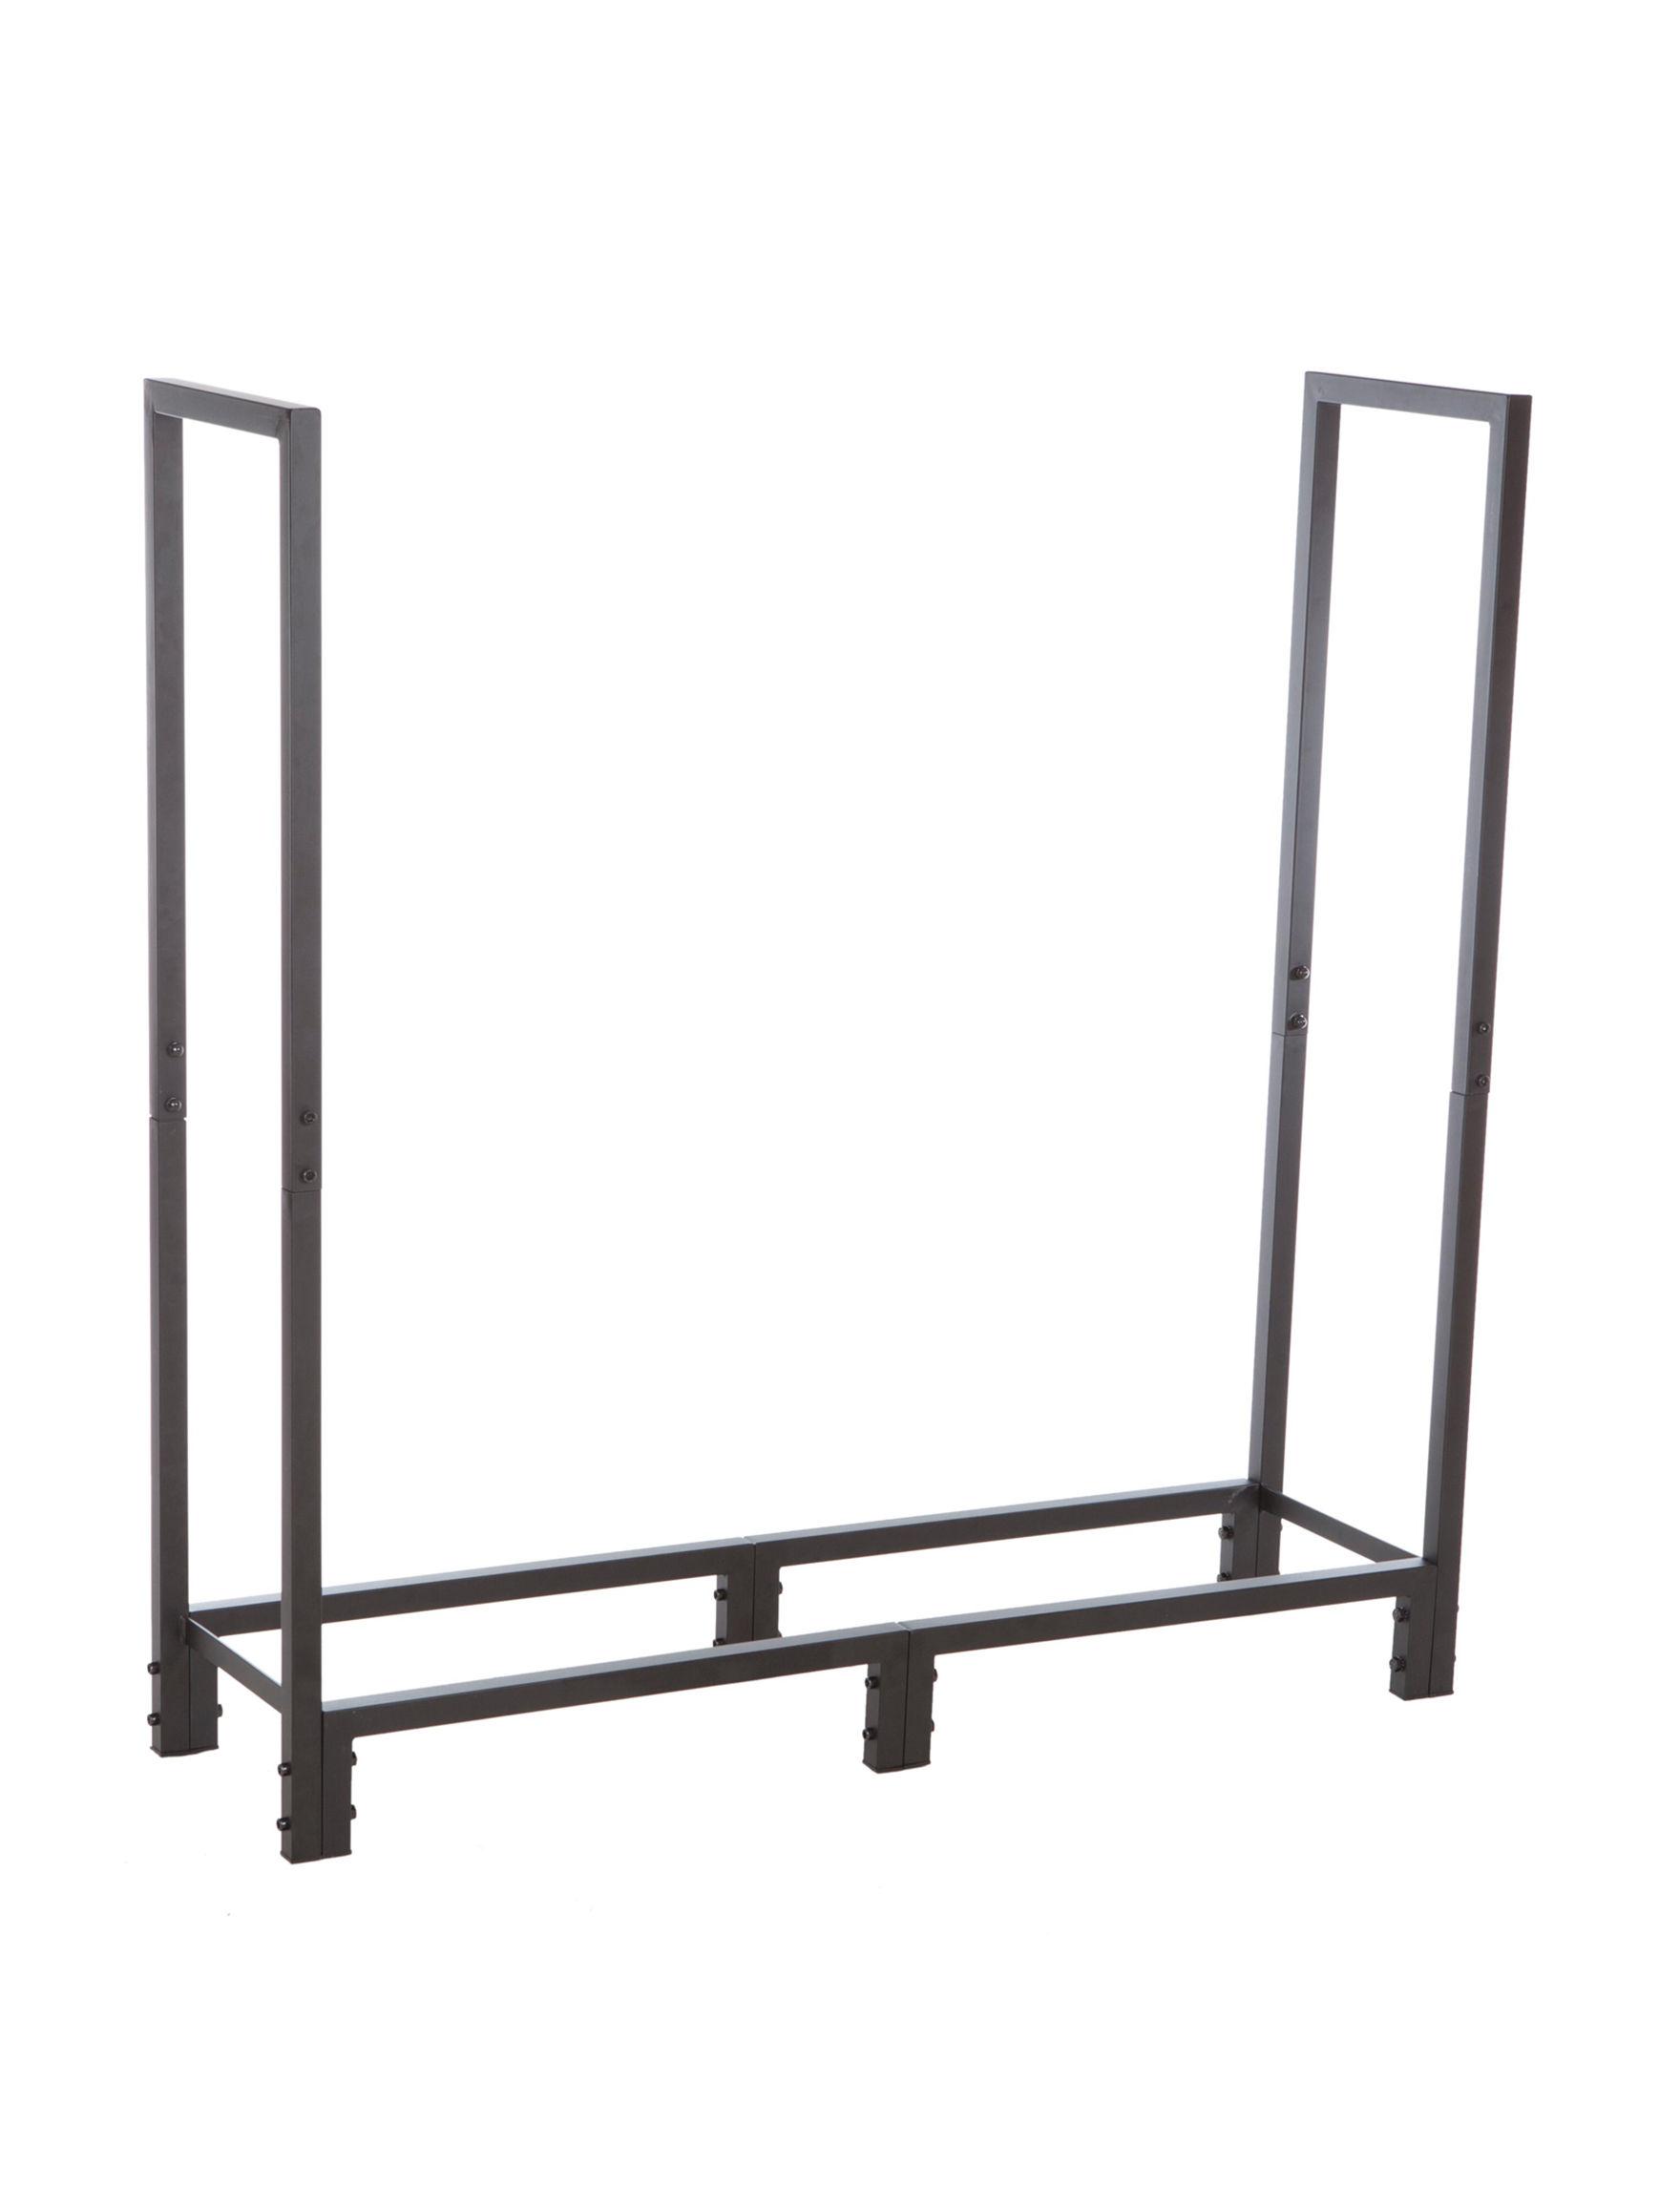 Fire Sense Black Patio & Outdoor Furniture Storage & Organization